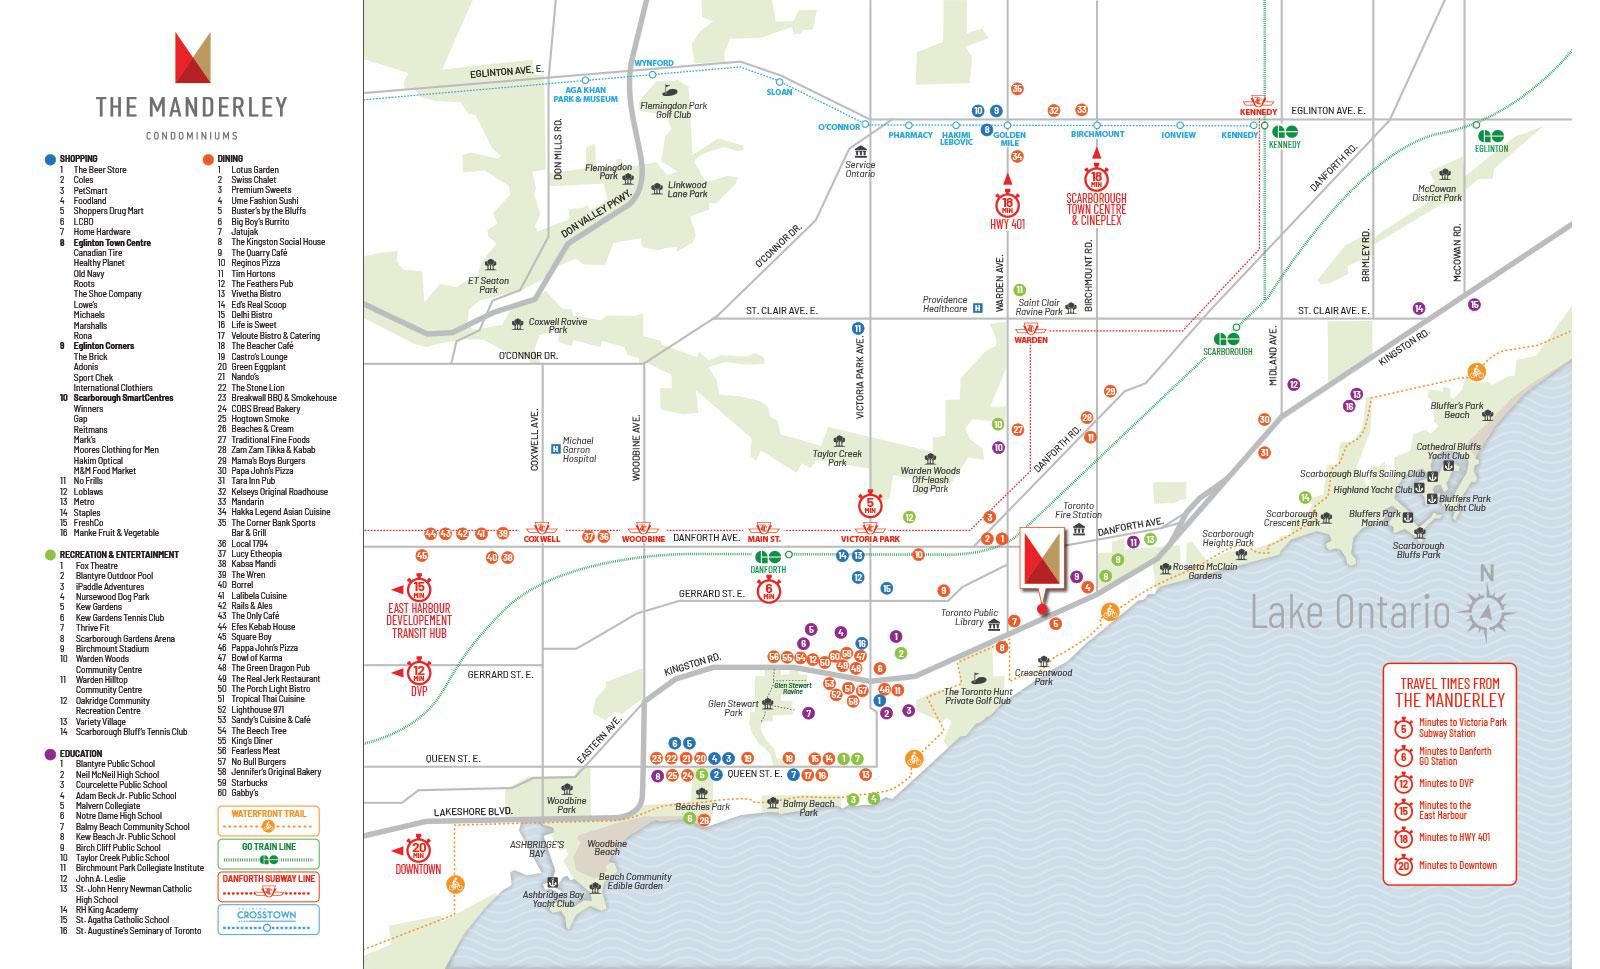 Manderley Map